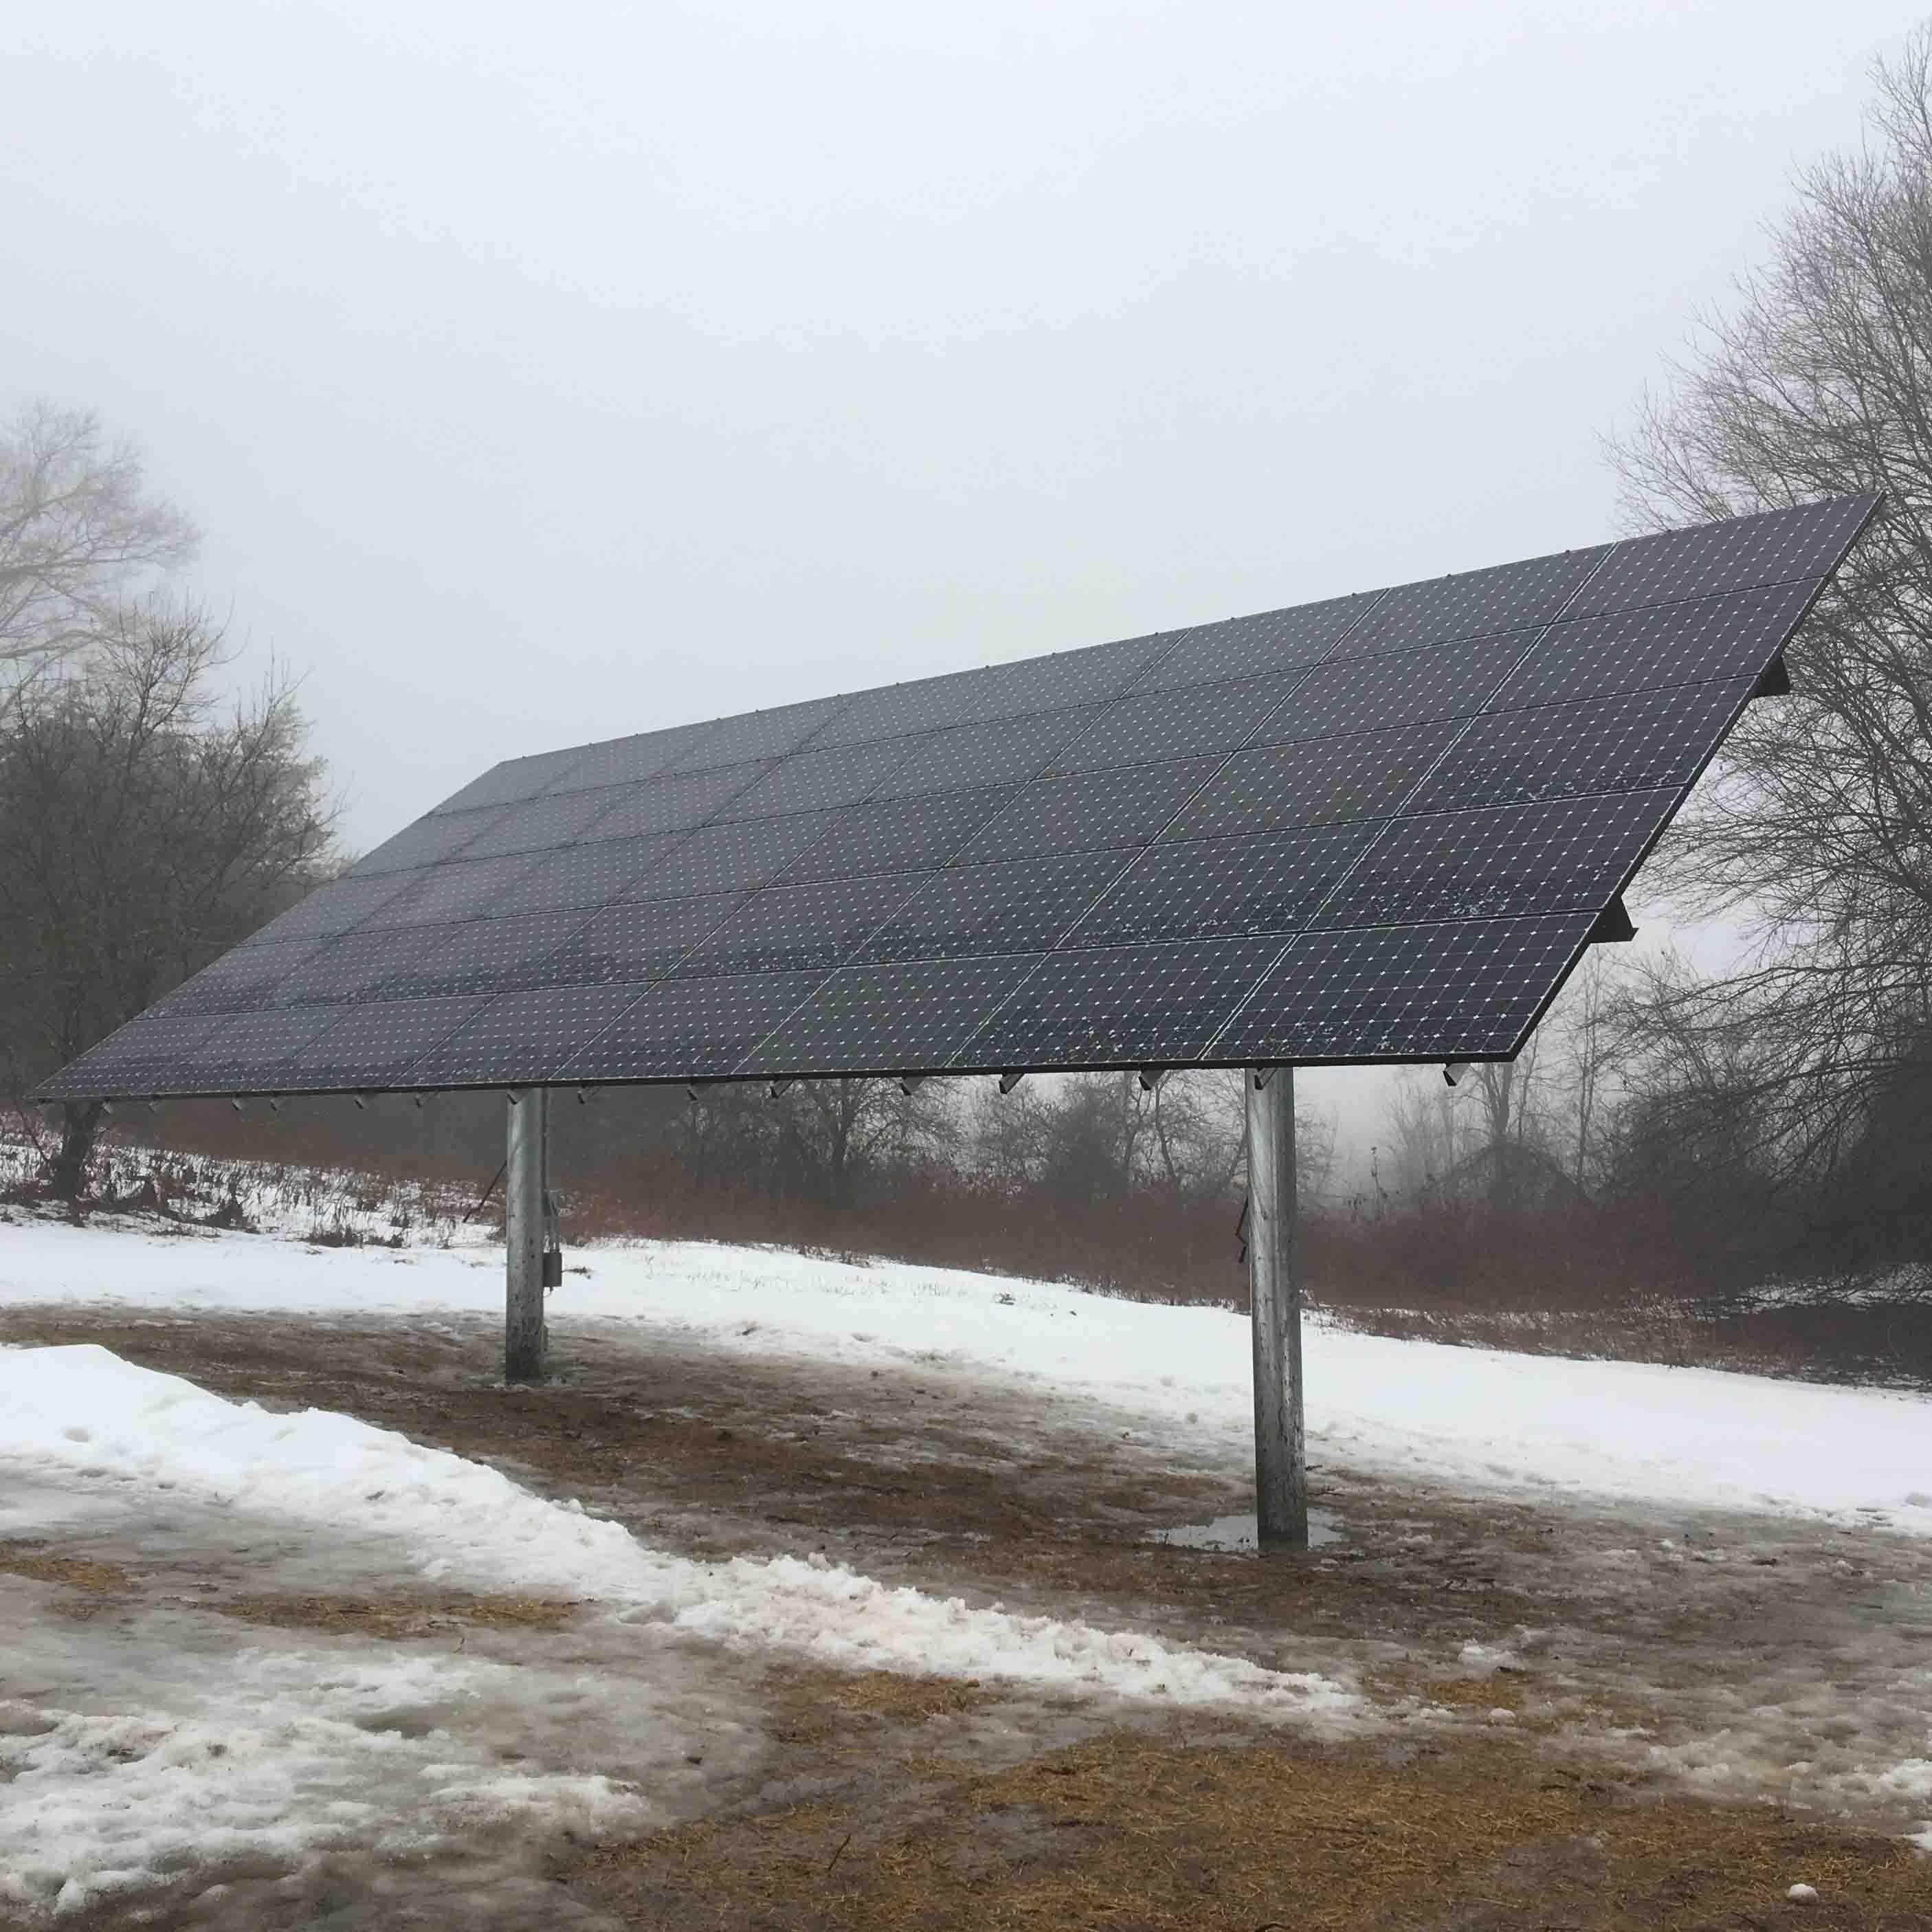 Top-of-Pole (TPM) Solar Array, 14.4 kW